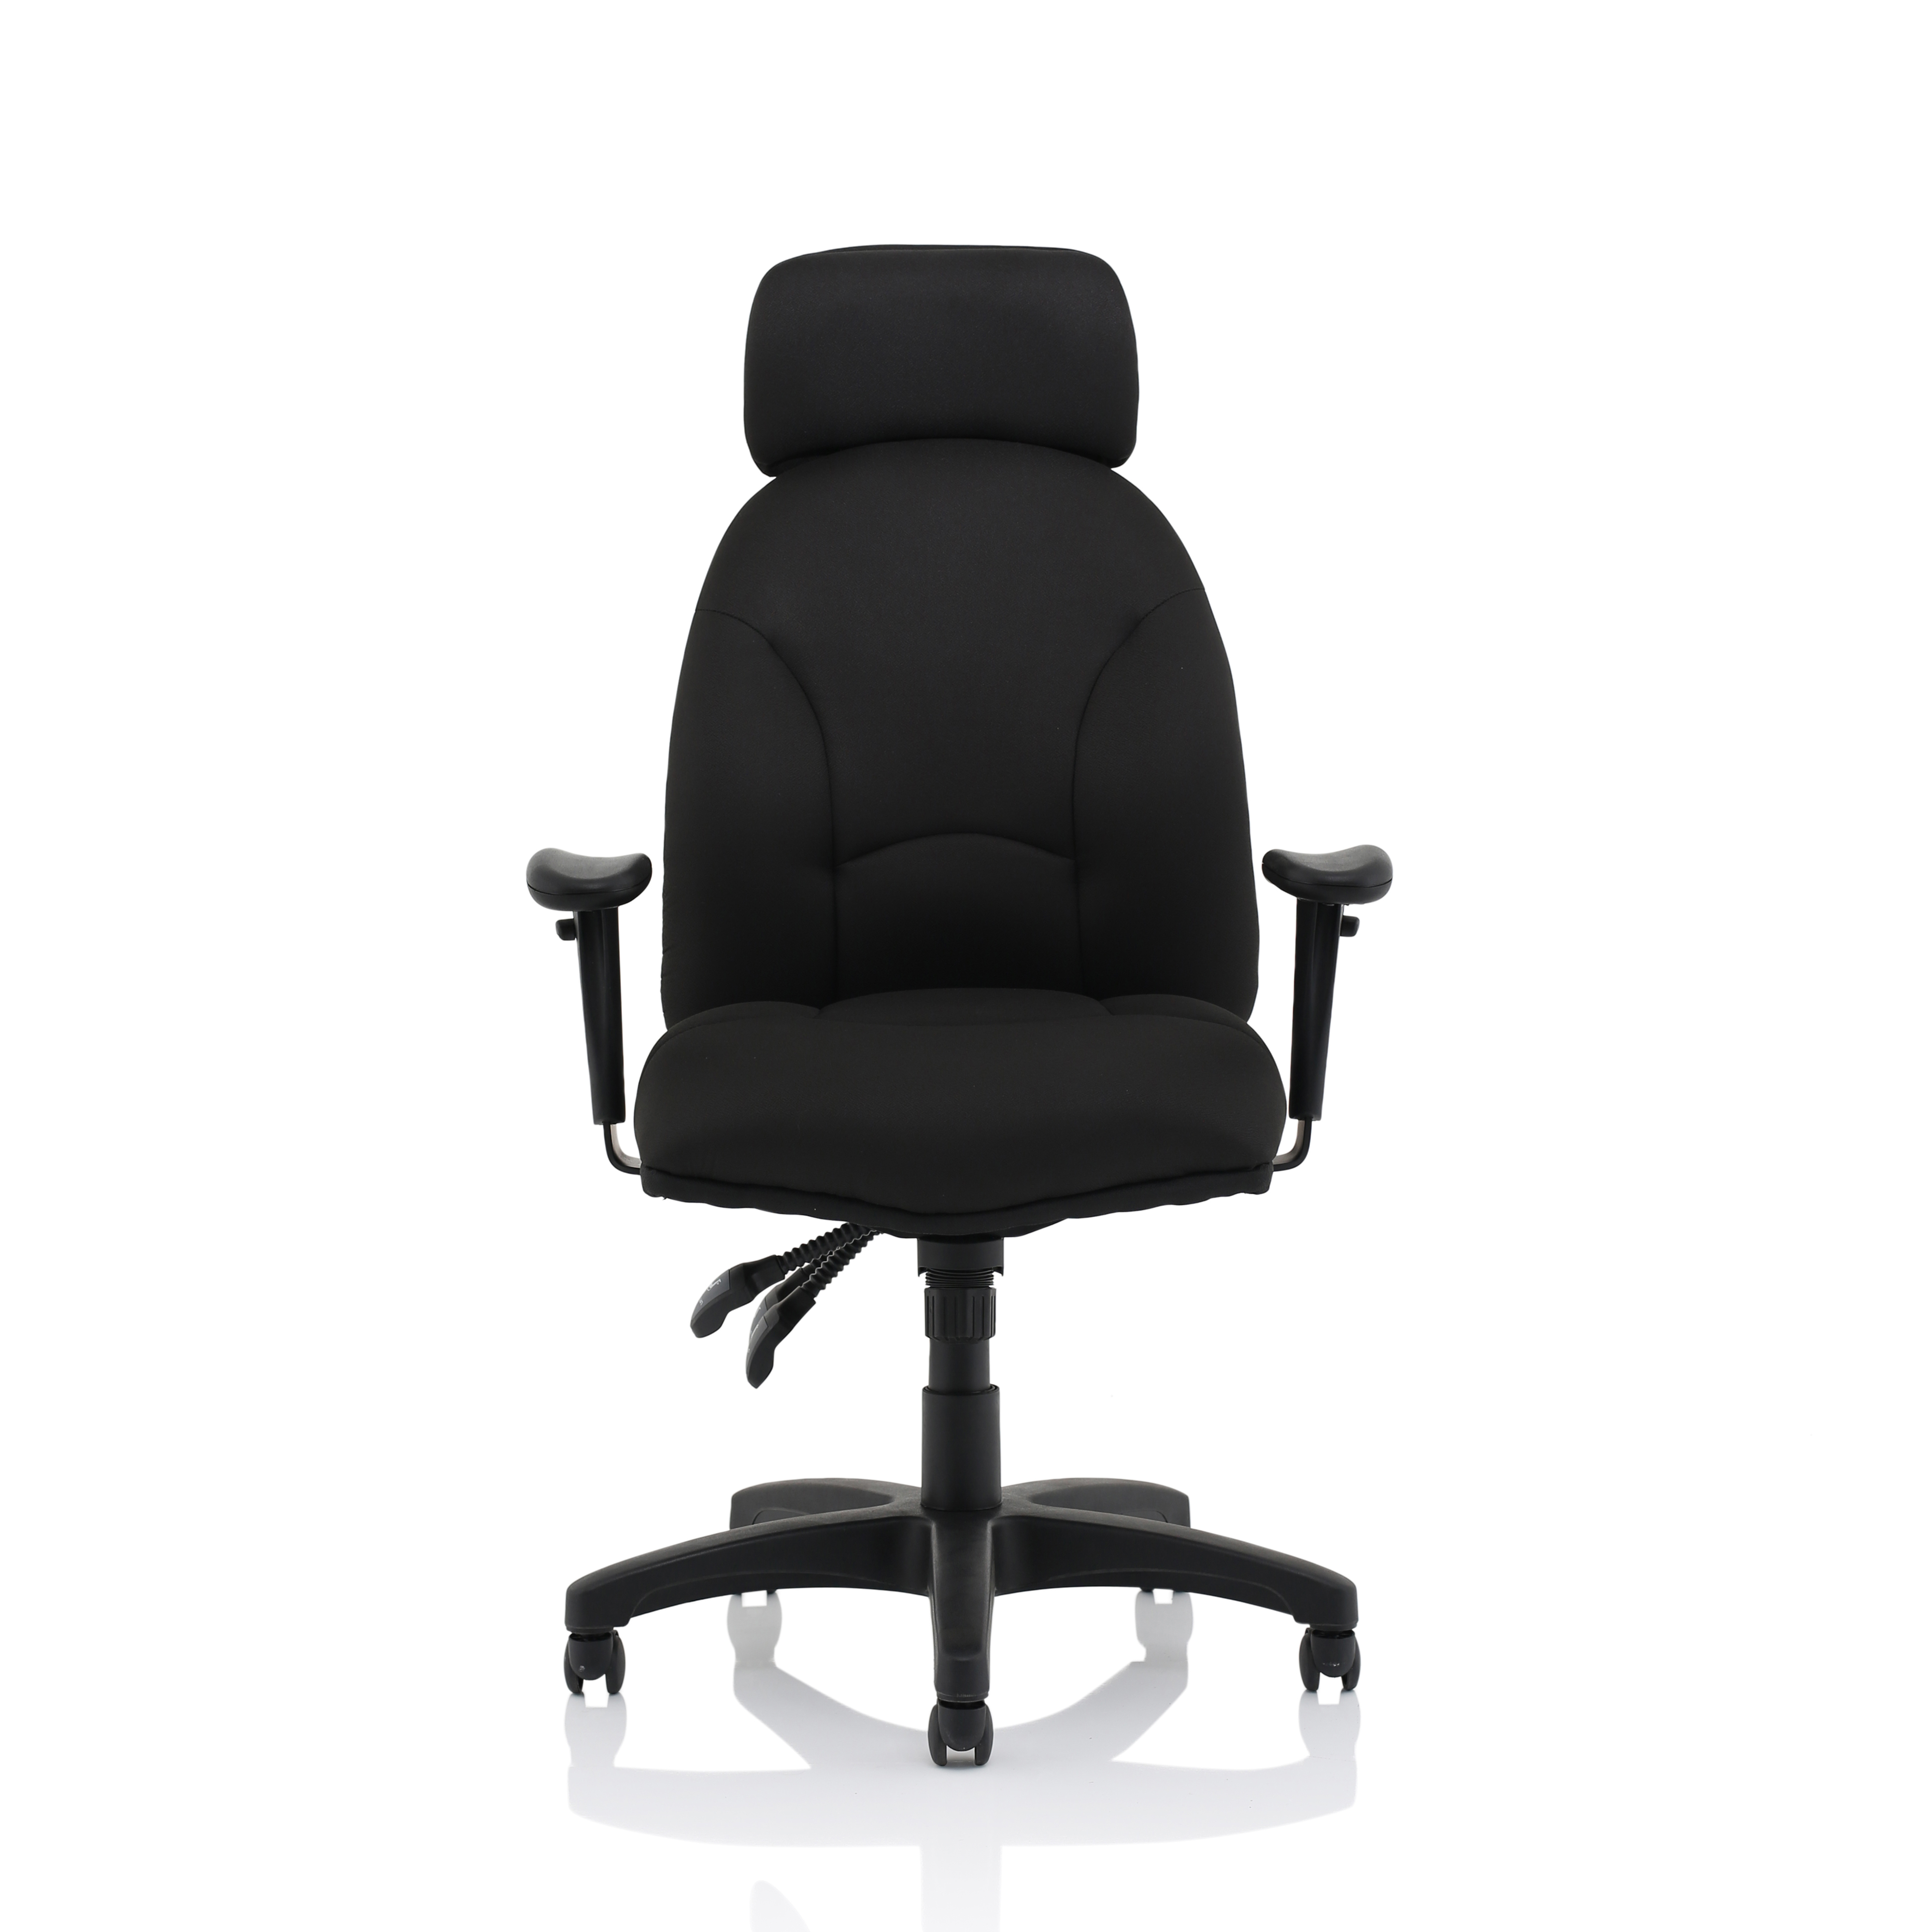 Trexus Energize Aviator Chair Black 540x450x490-590mm Ref 11199-01Black